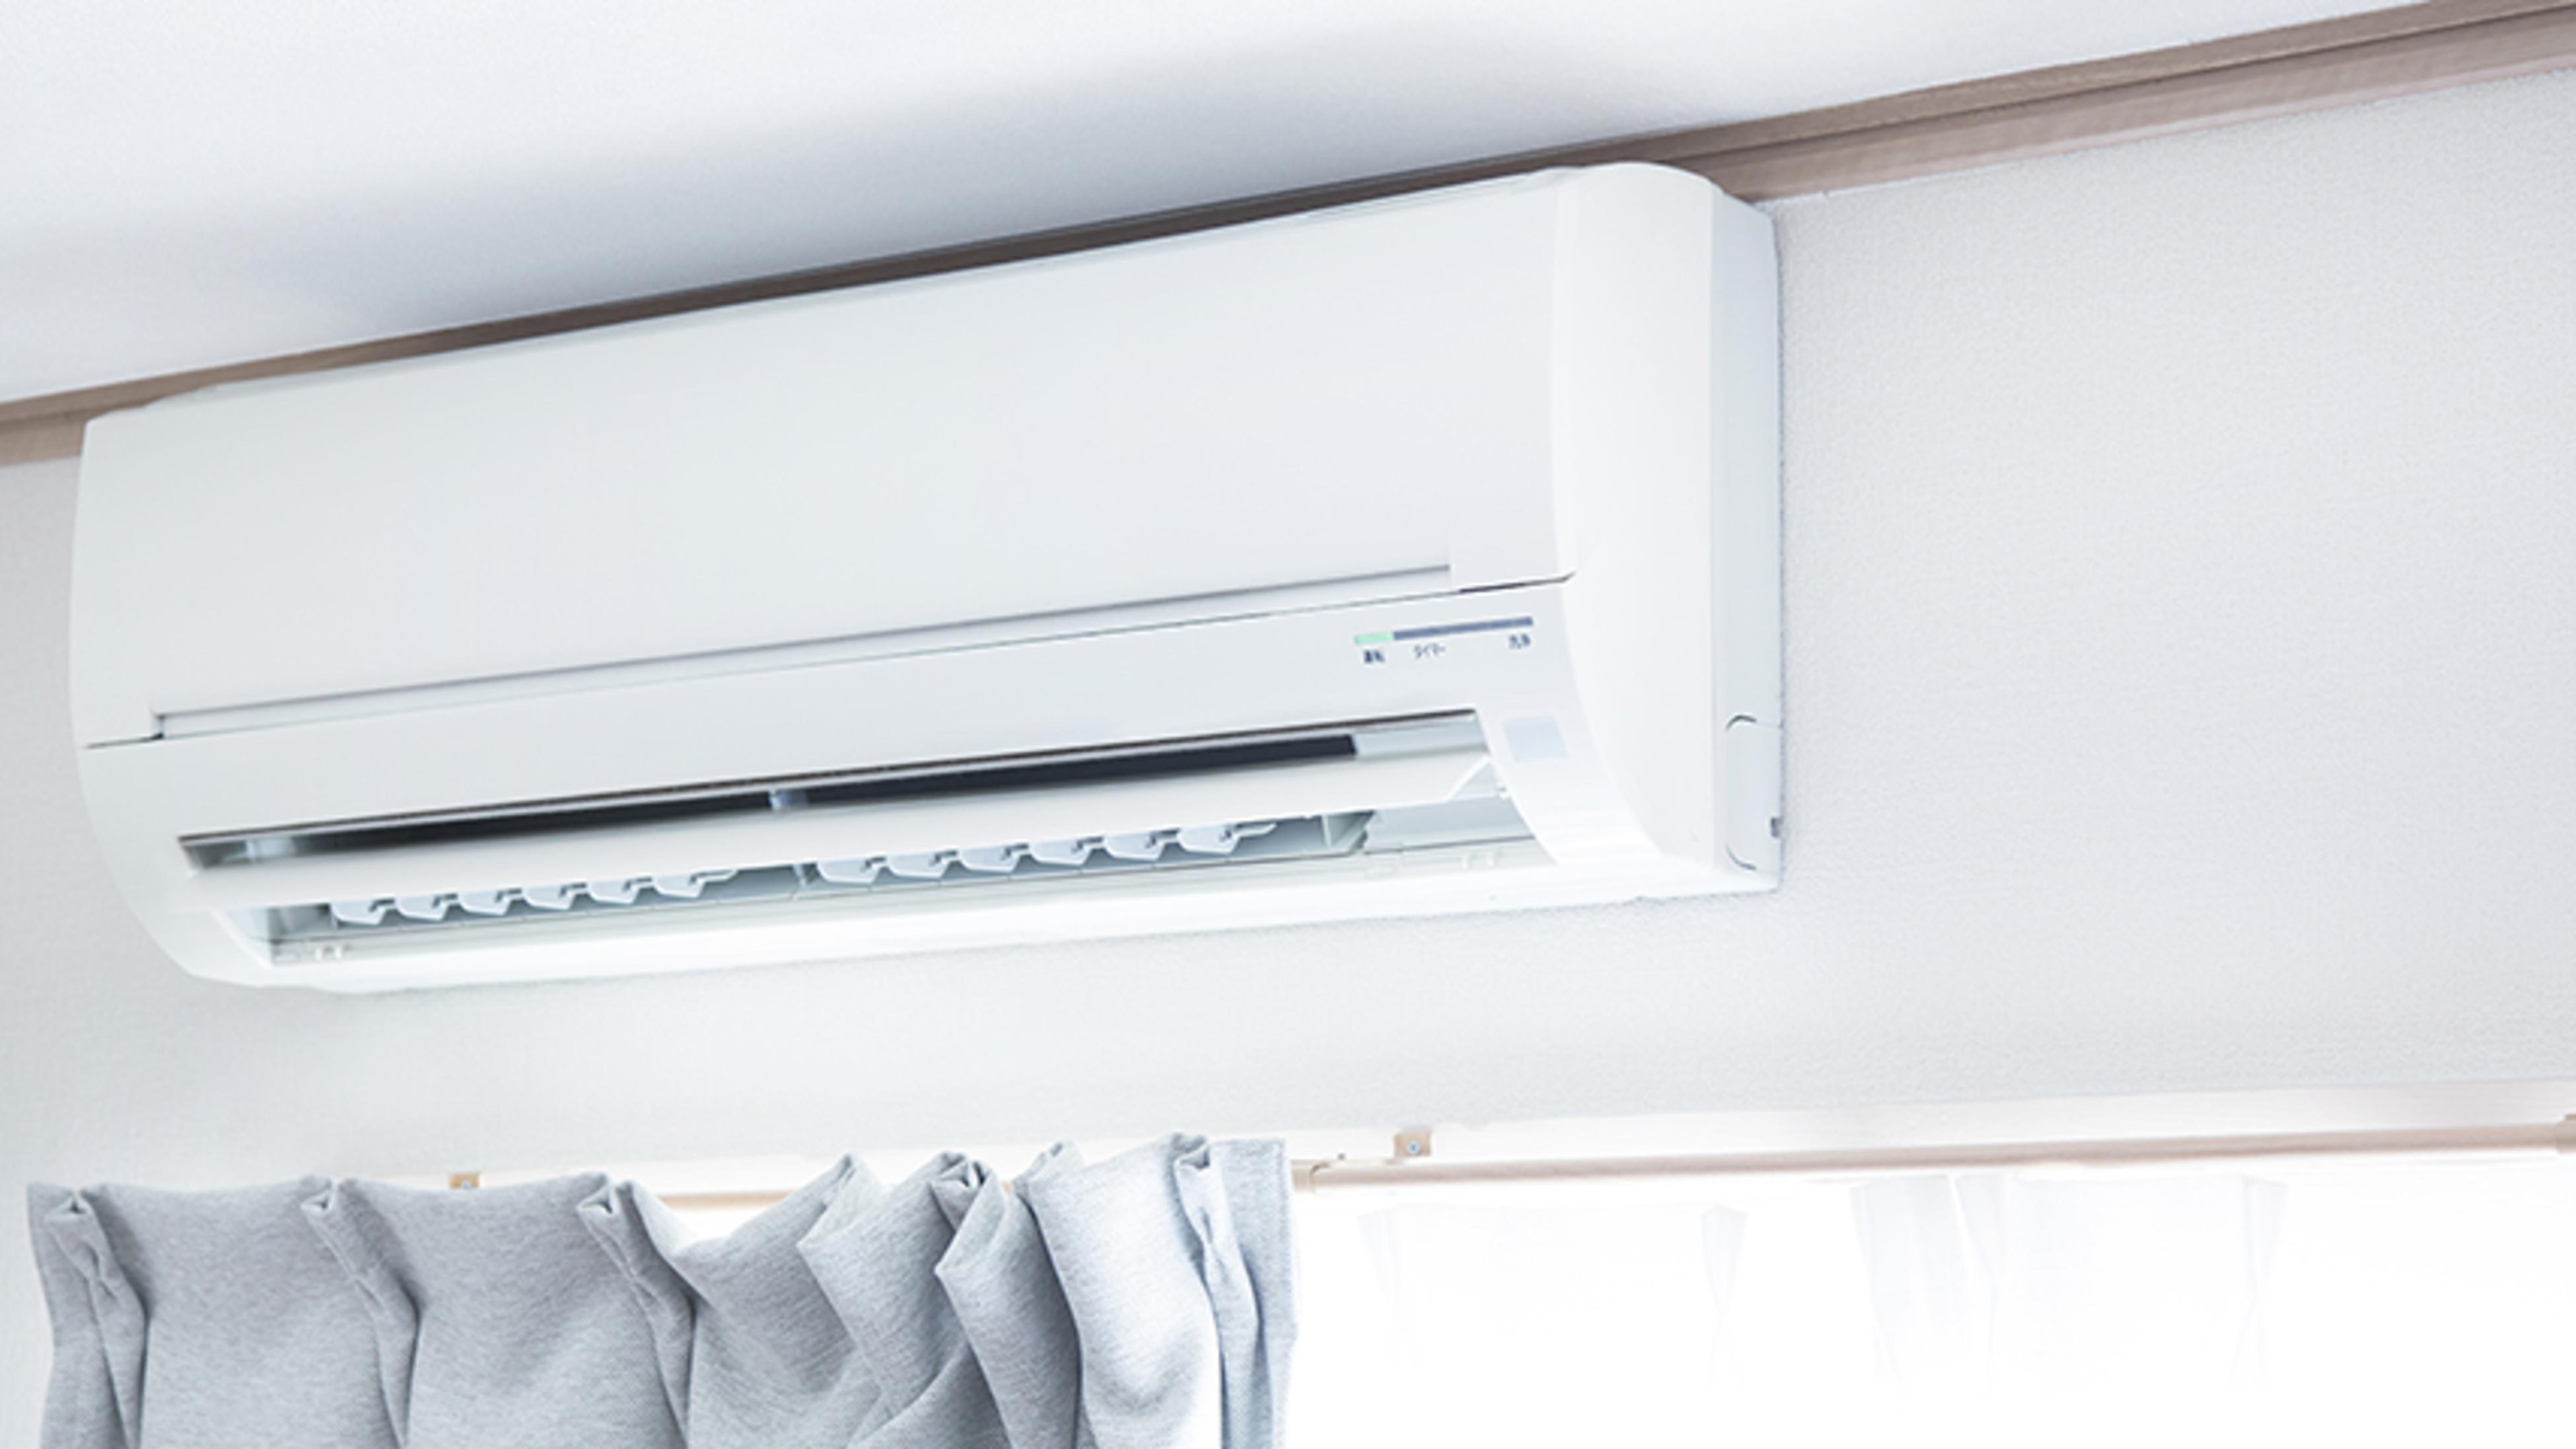 Airconditioning.